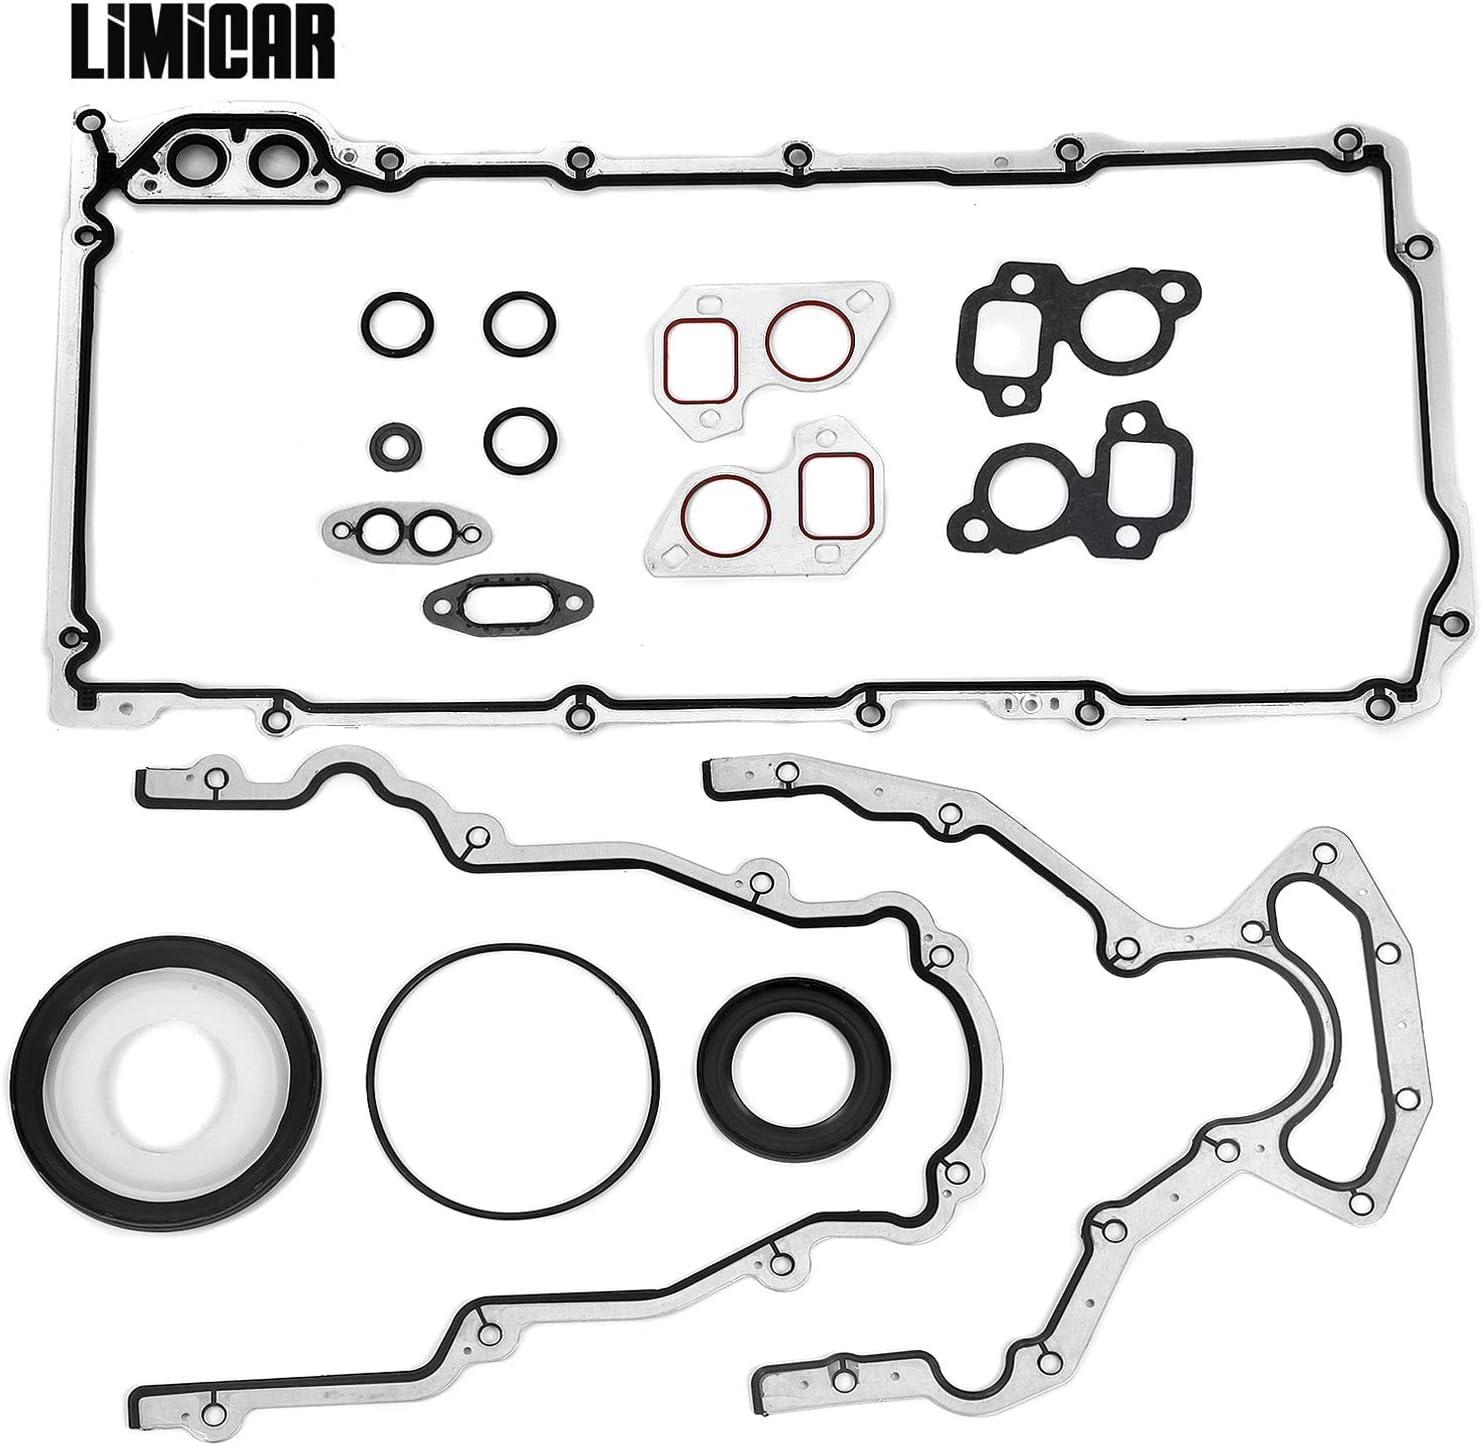 LIMICAR Engine Conversion Lower Gasket Set CS5975A CS9284 Compatible with 1997-2011 GMC Fits Ford Isuzu Saab 5.7L 6.0L 6.2L OHV LS3 VIN H M